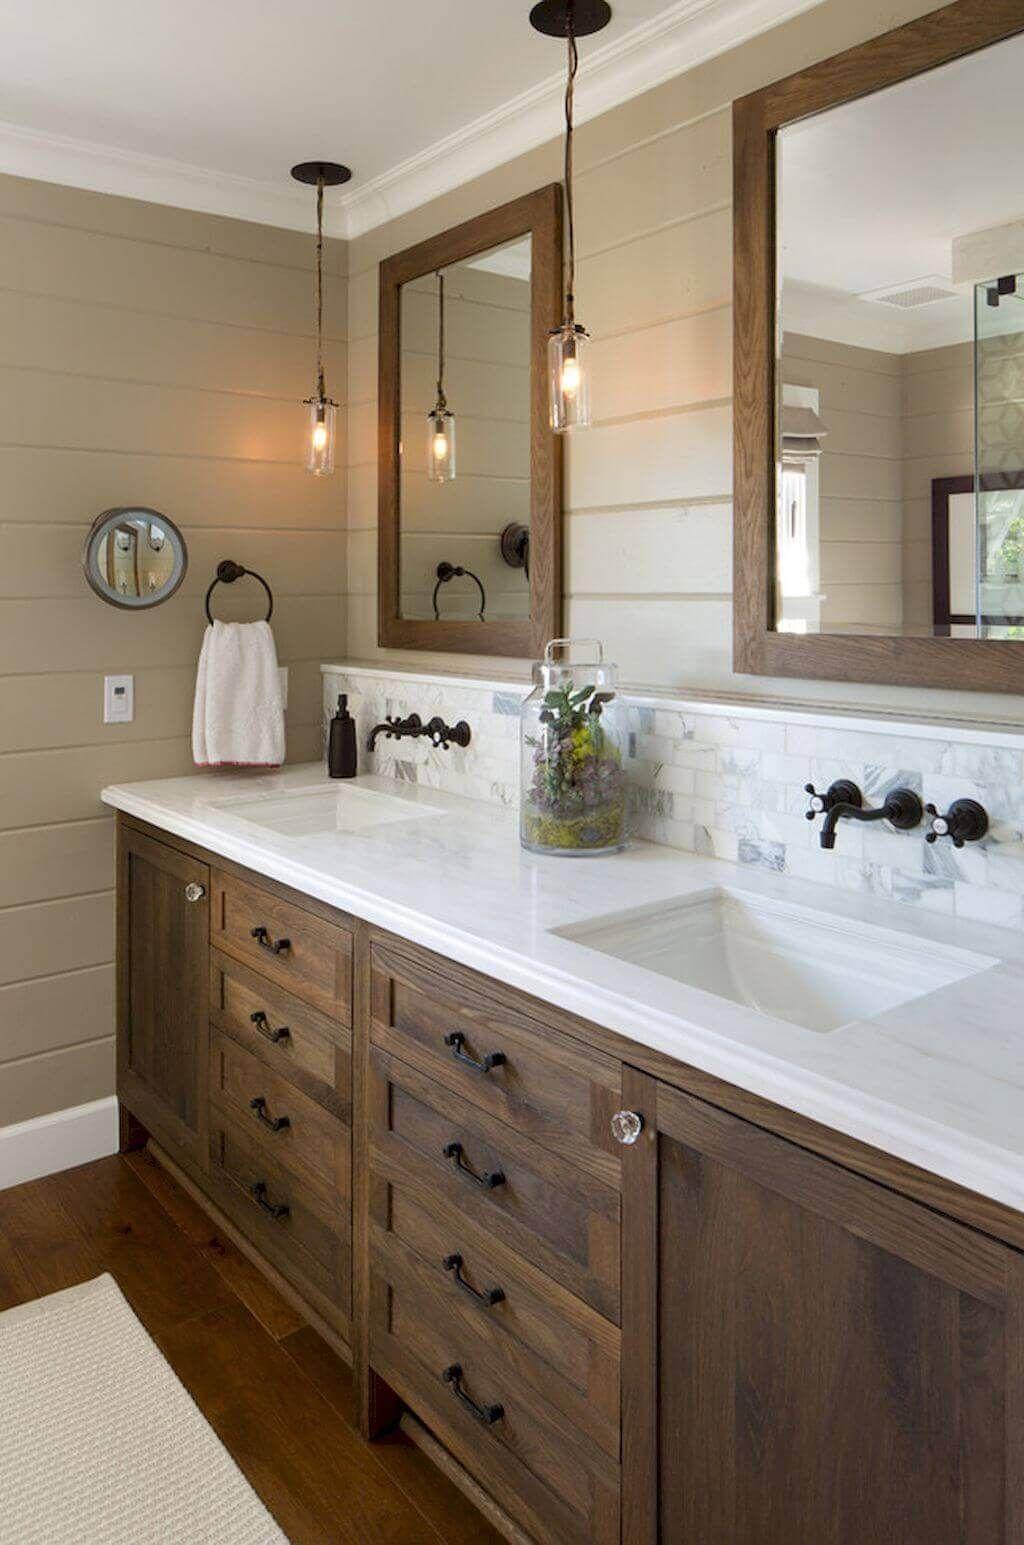 33 Amazing Modern Farmhouse Interior Design Ideas You Must Try Farmhouse Bathroom Decor Bathroom Remodel Master Farmhouse Master Bathroom